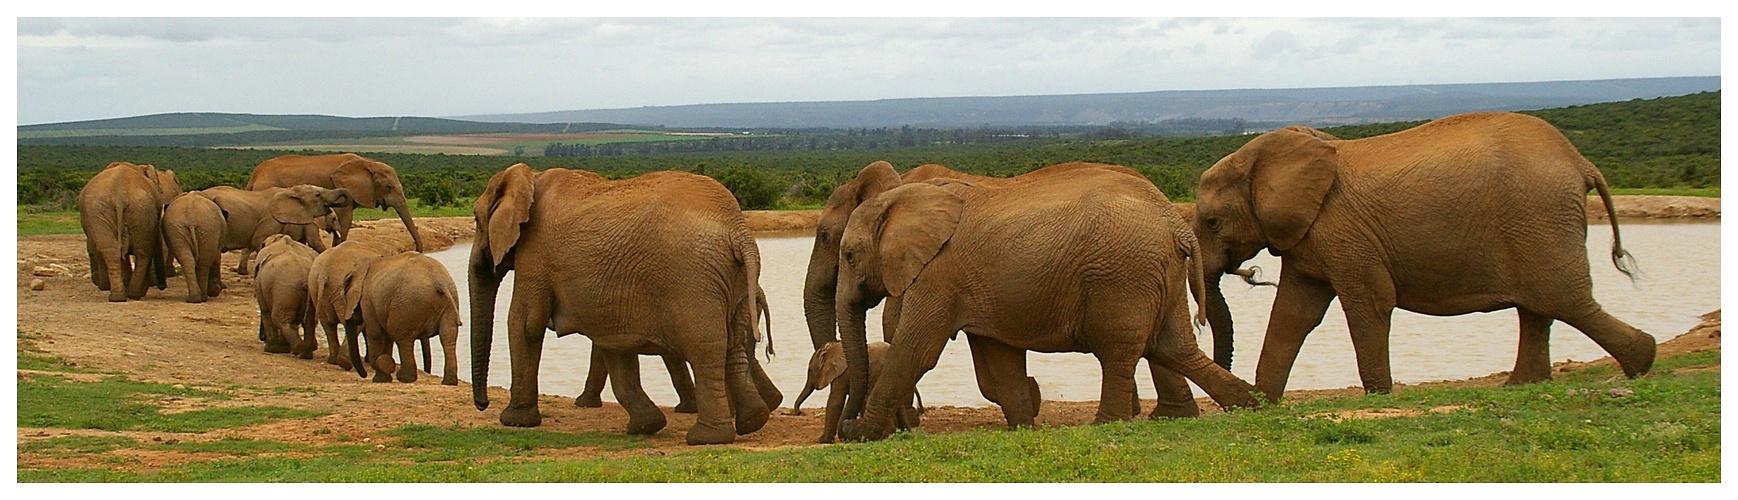 Elefanten-Parade (Reload)